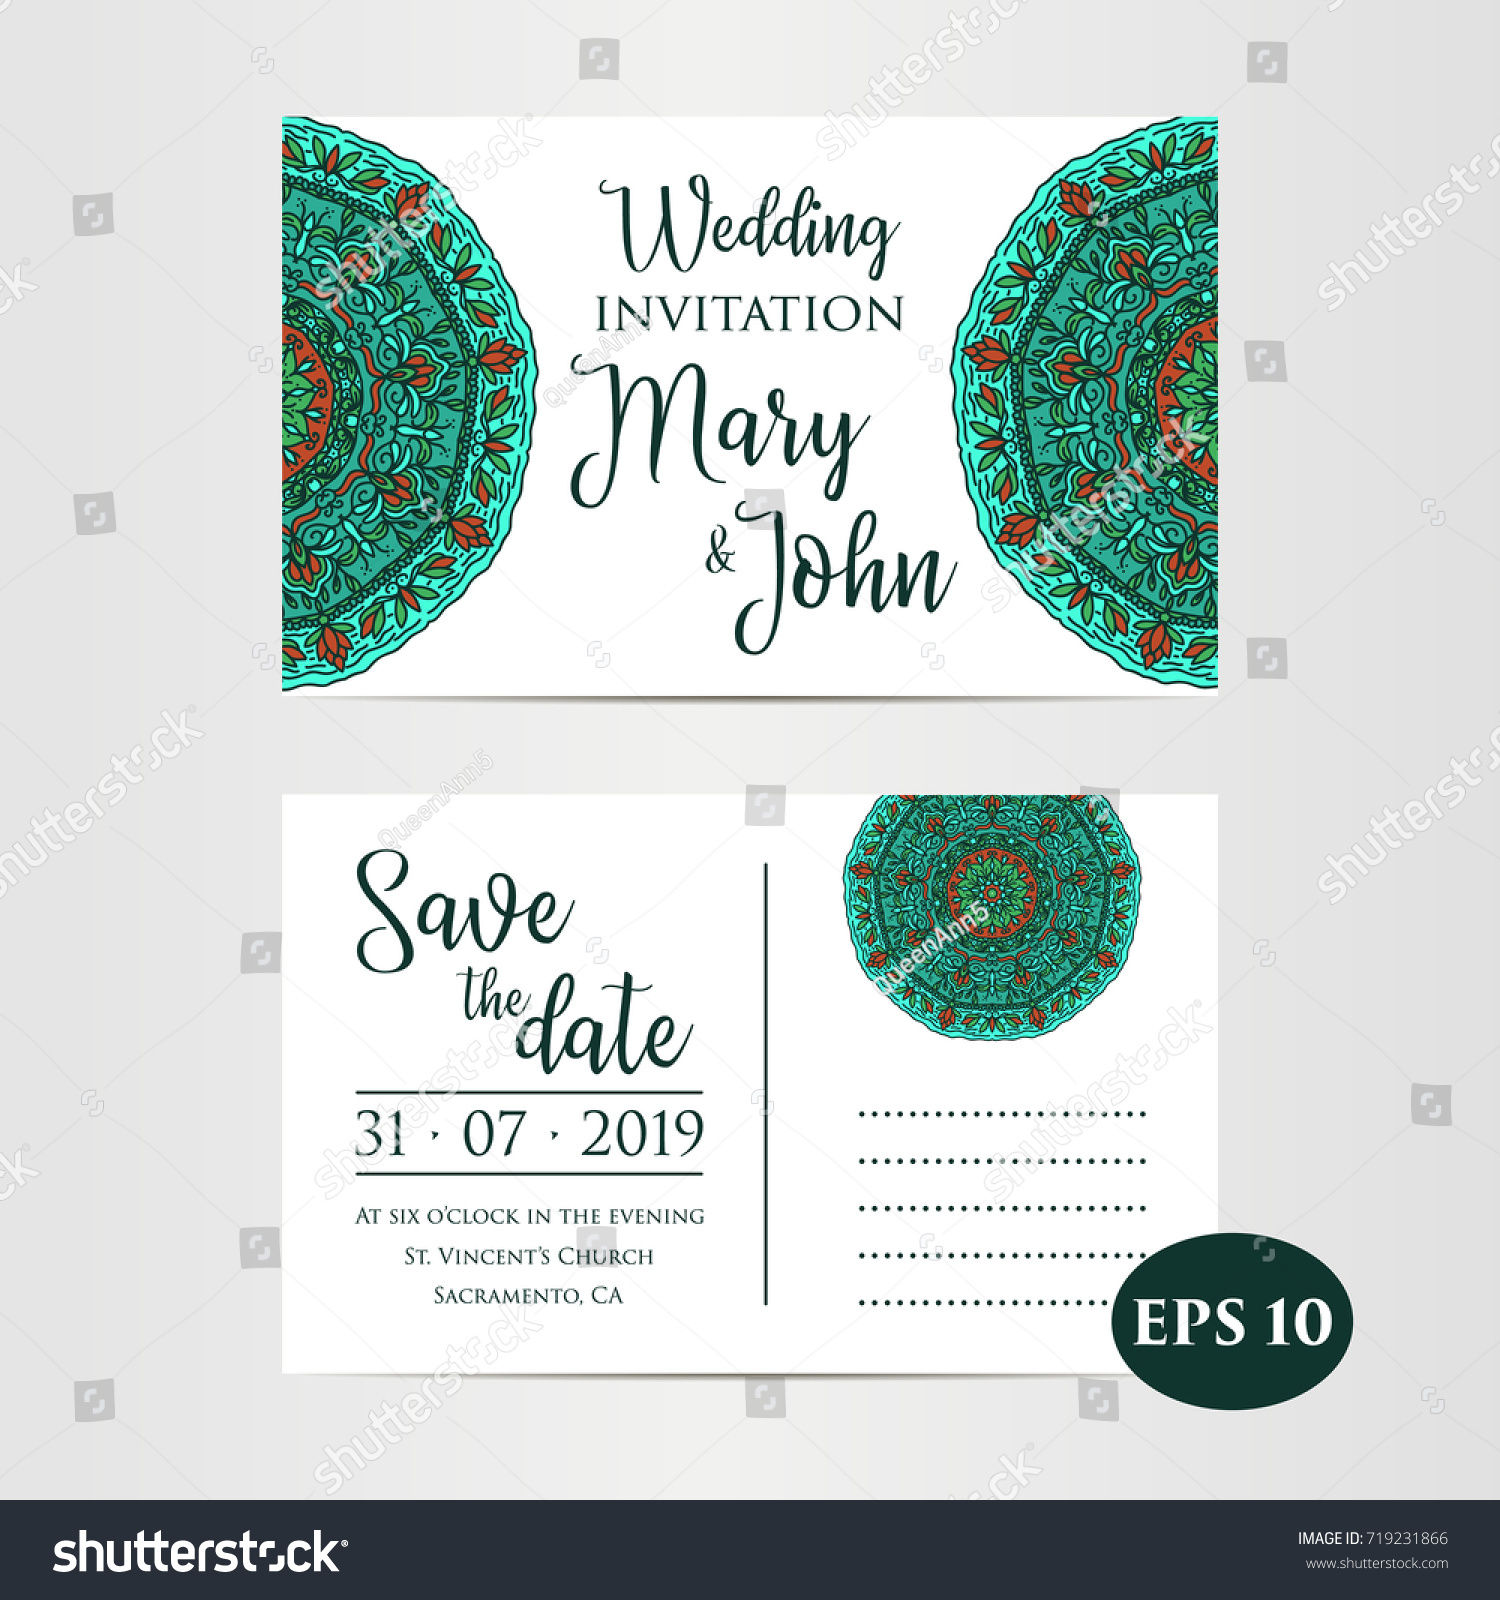 vintage template design layout wedding invitation stock vector